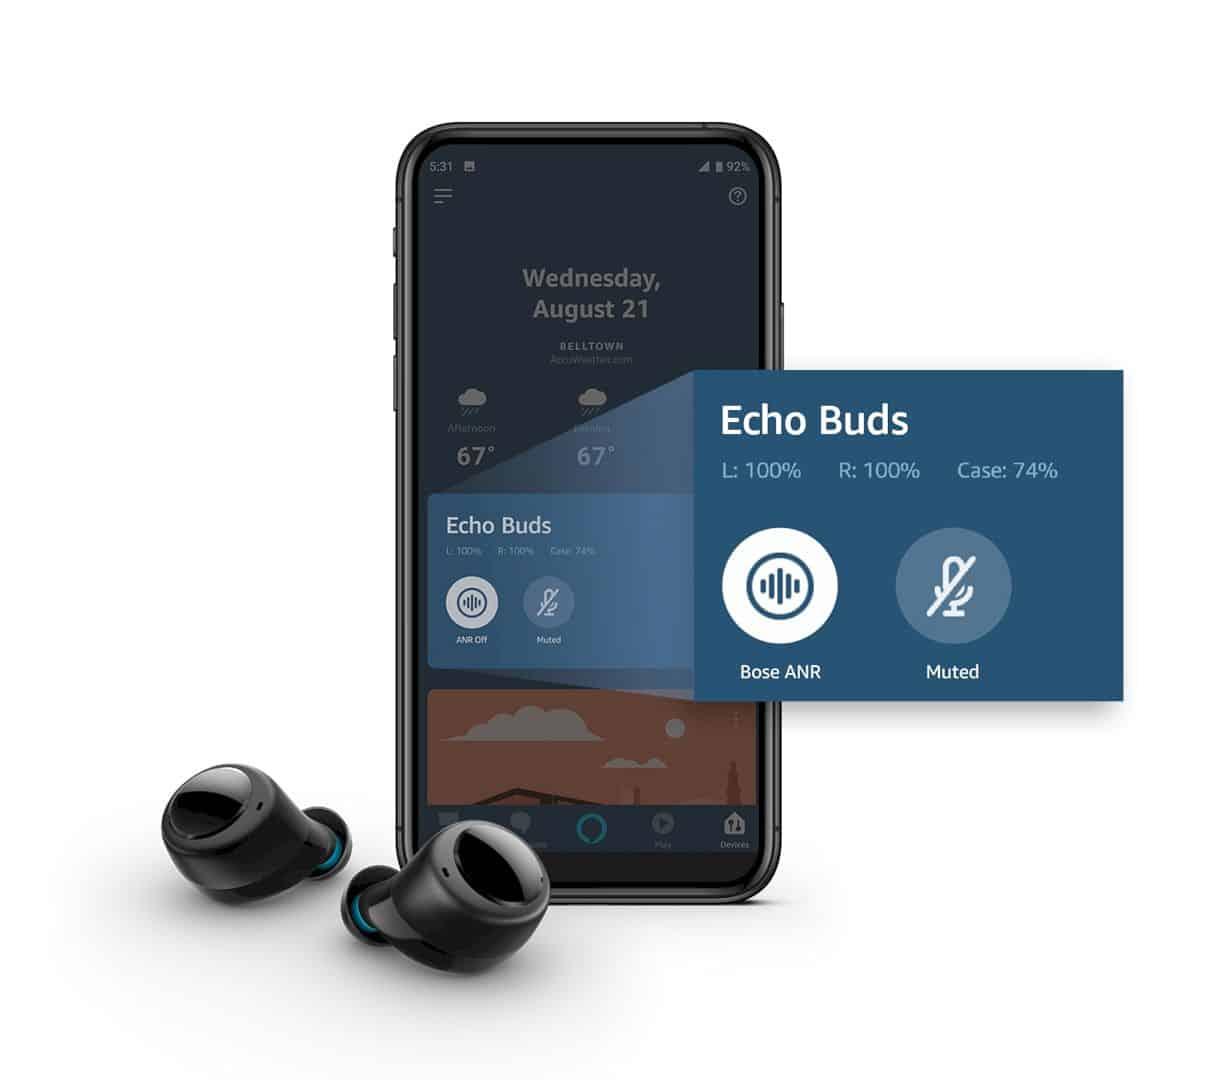 Echo Buds 3